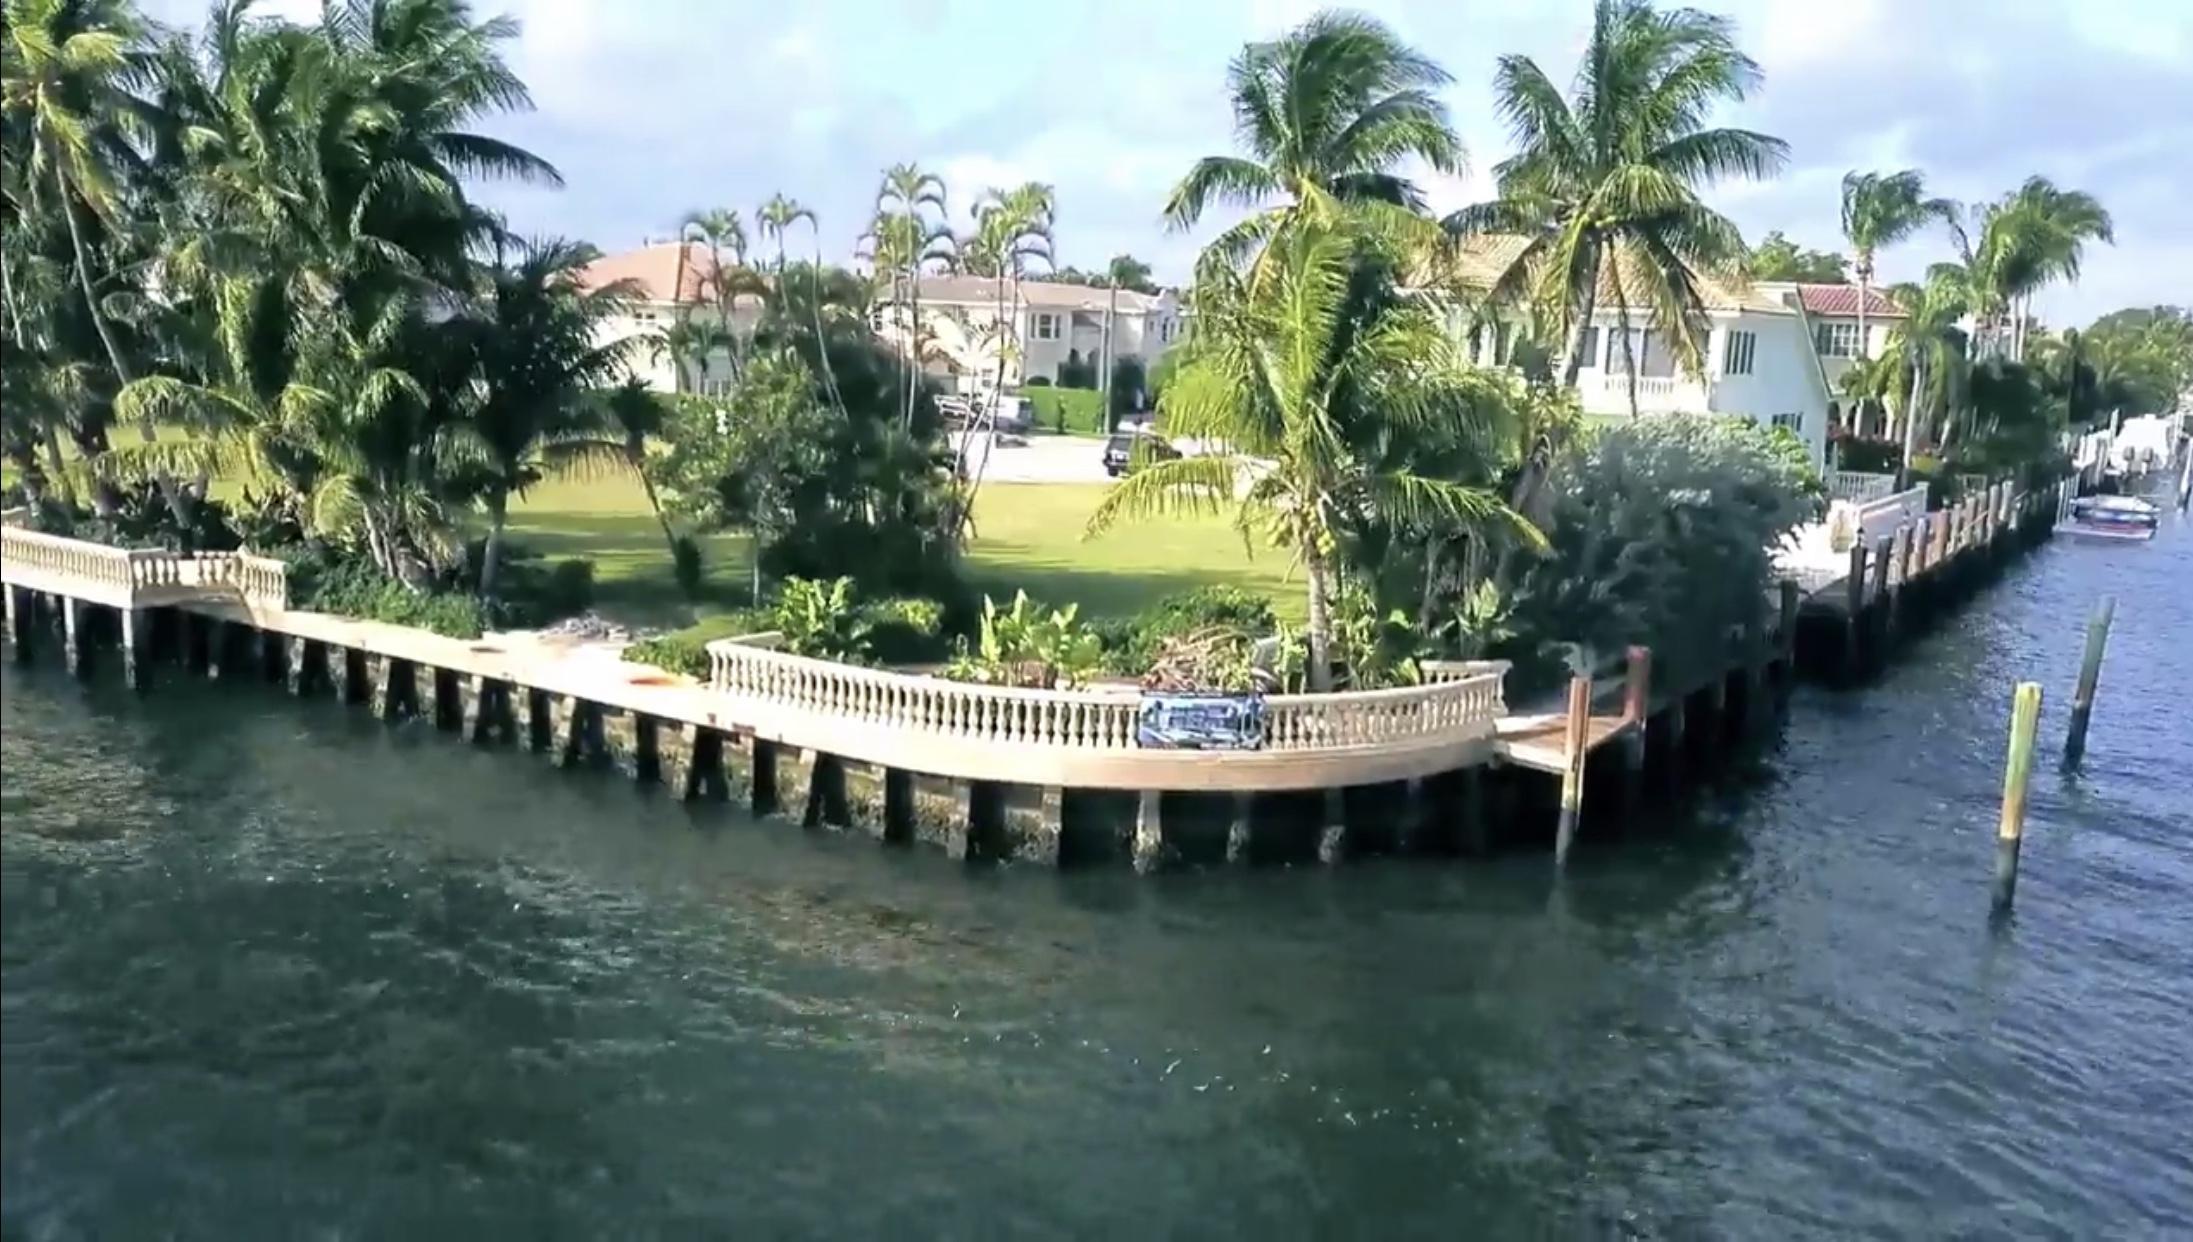 870 Havana Drive Lot 13 Boca Raton, FL 33487 photo 6